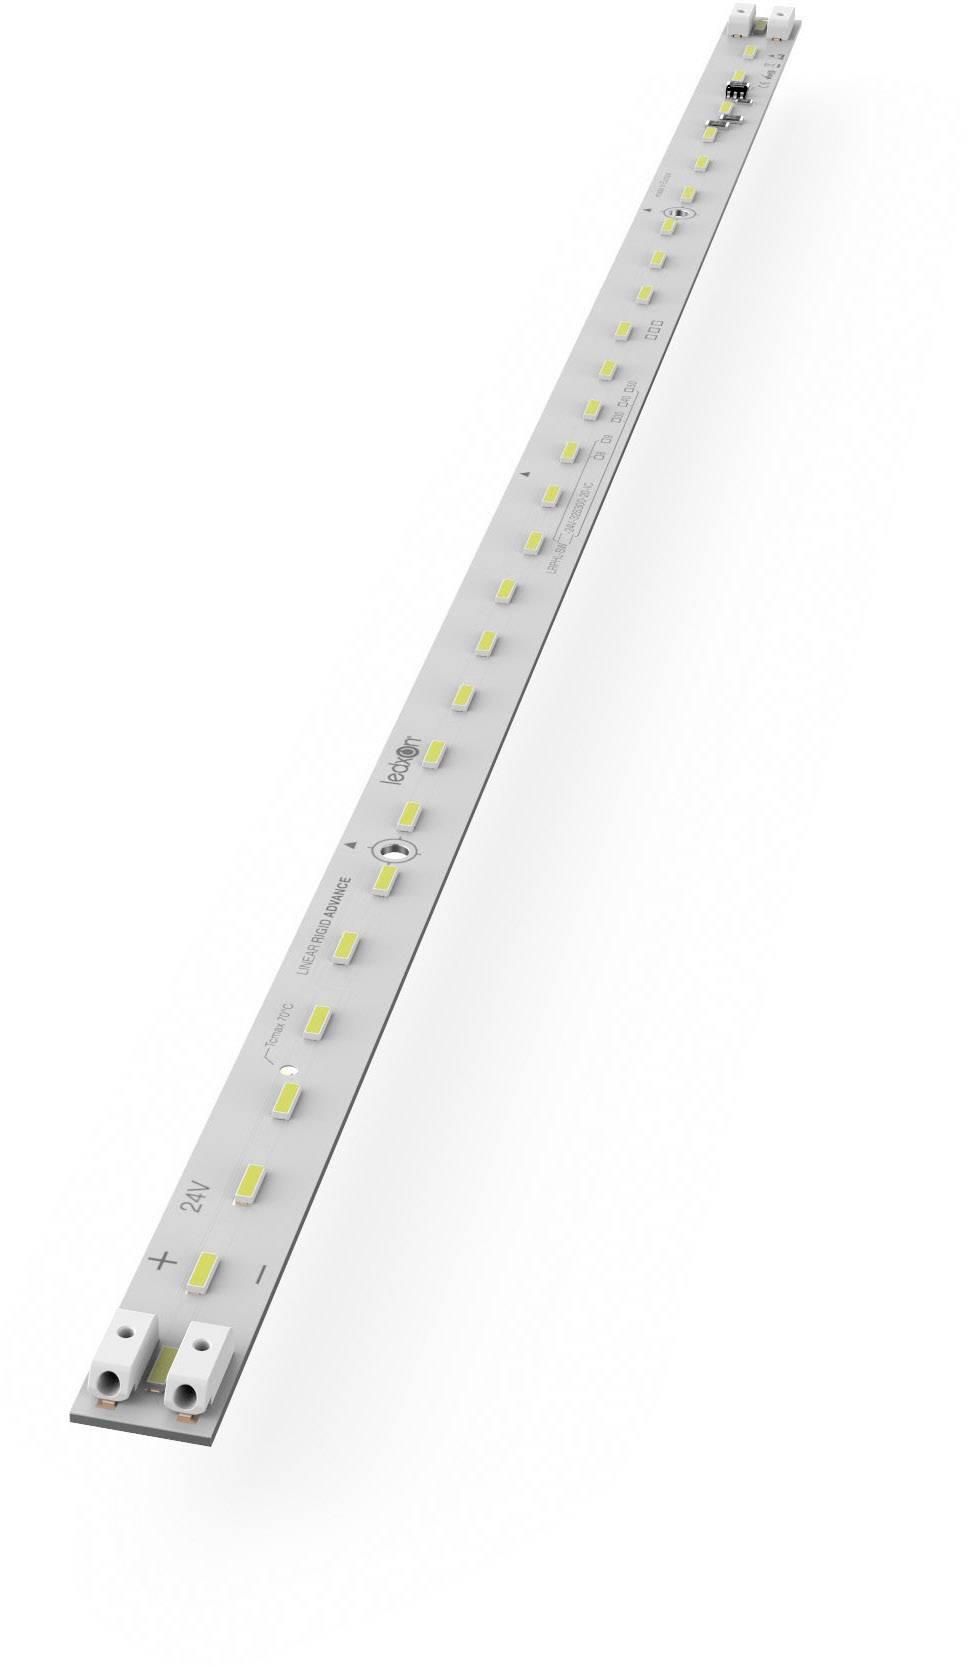 LED lišta ledxon LRALL-SW830-24V-28S103-20-IC 9009360, 24 V, teplá bílá, 30 cm